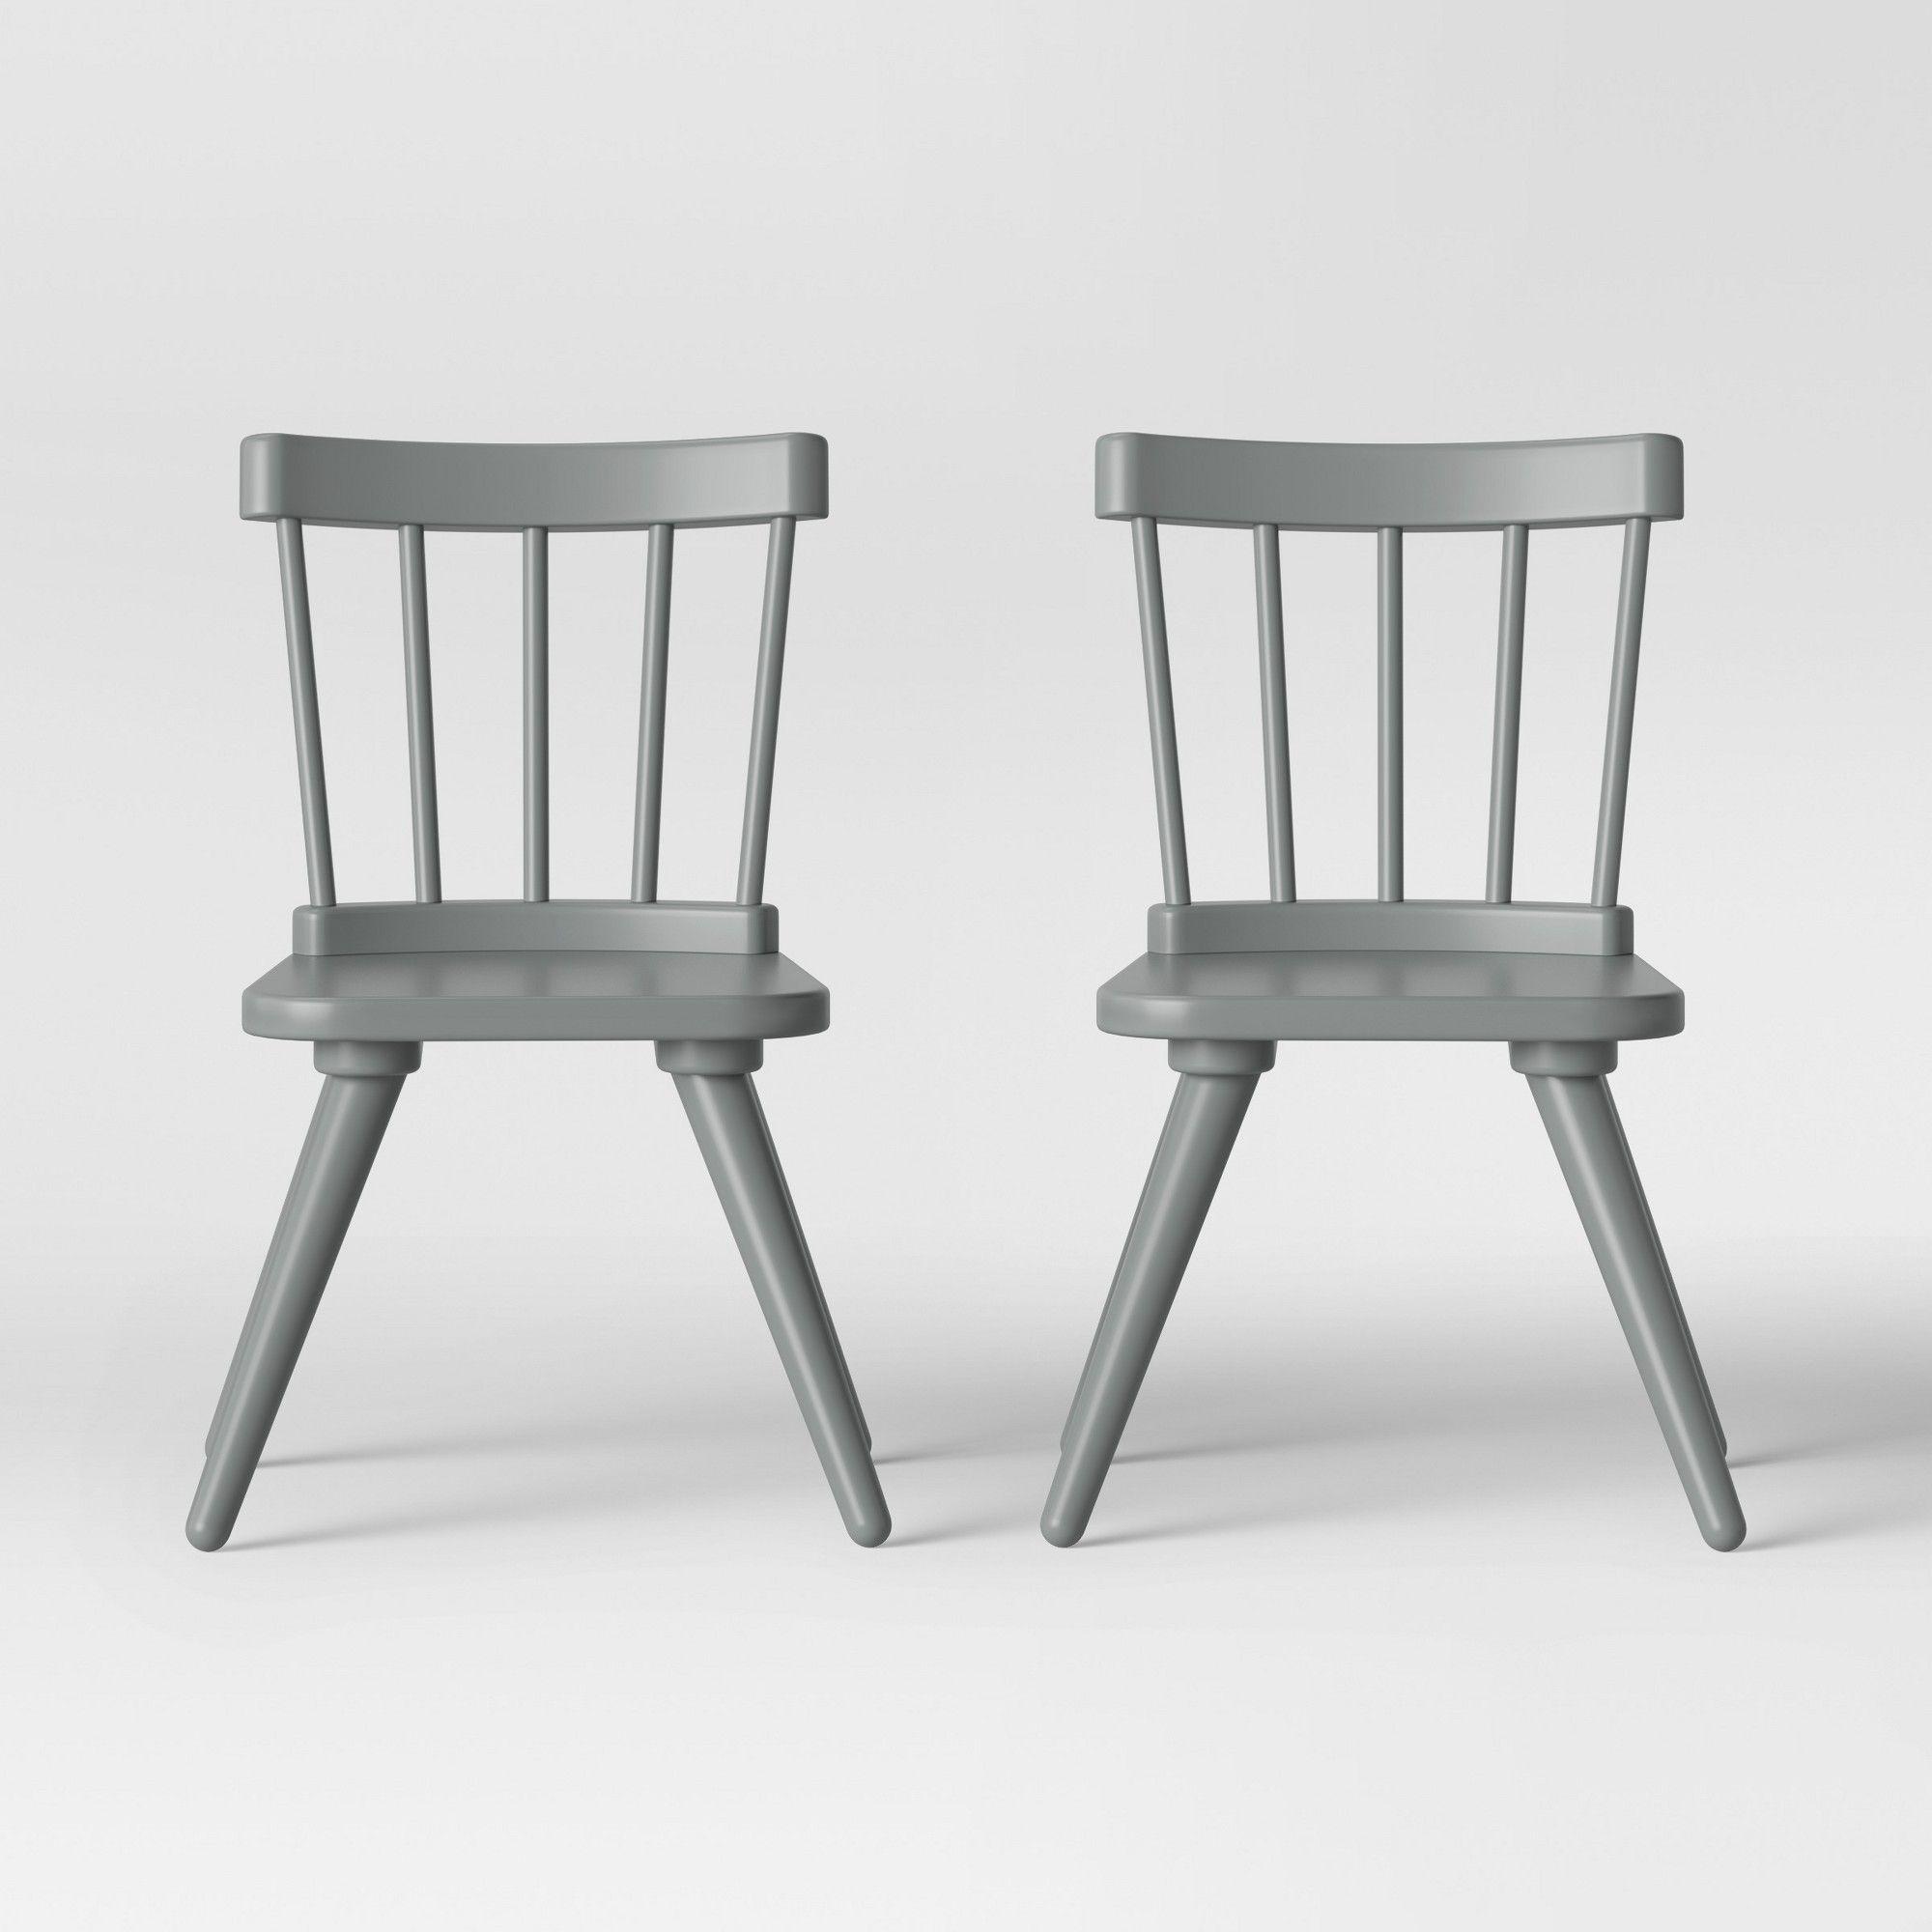 c4bec099921c Set of 2 Kids Windsor Wooden Chairs Gray - Pillowfort